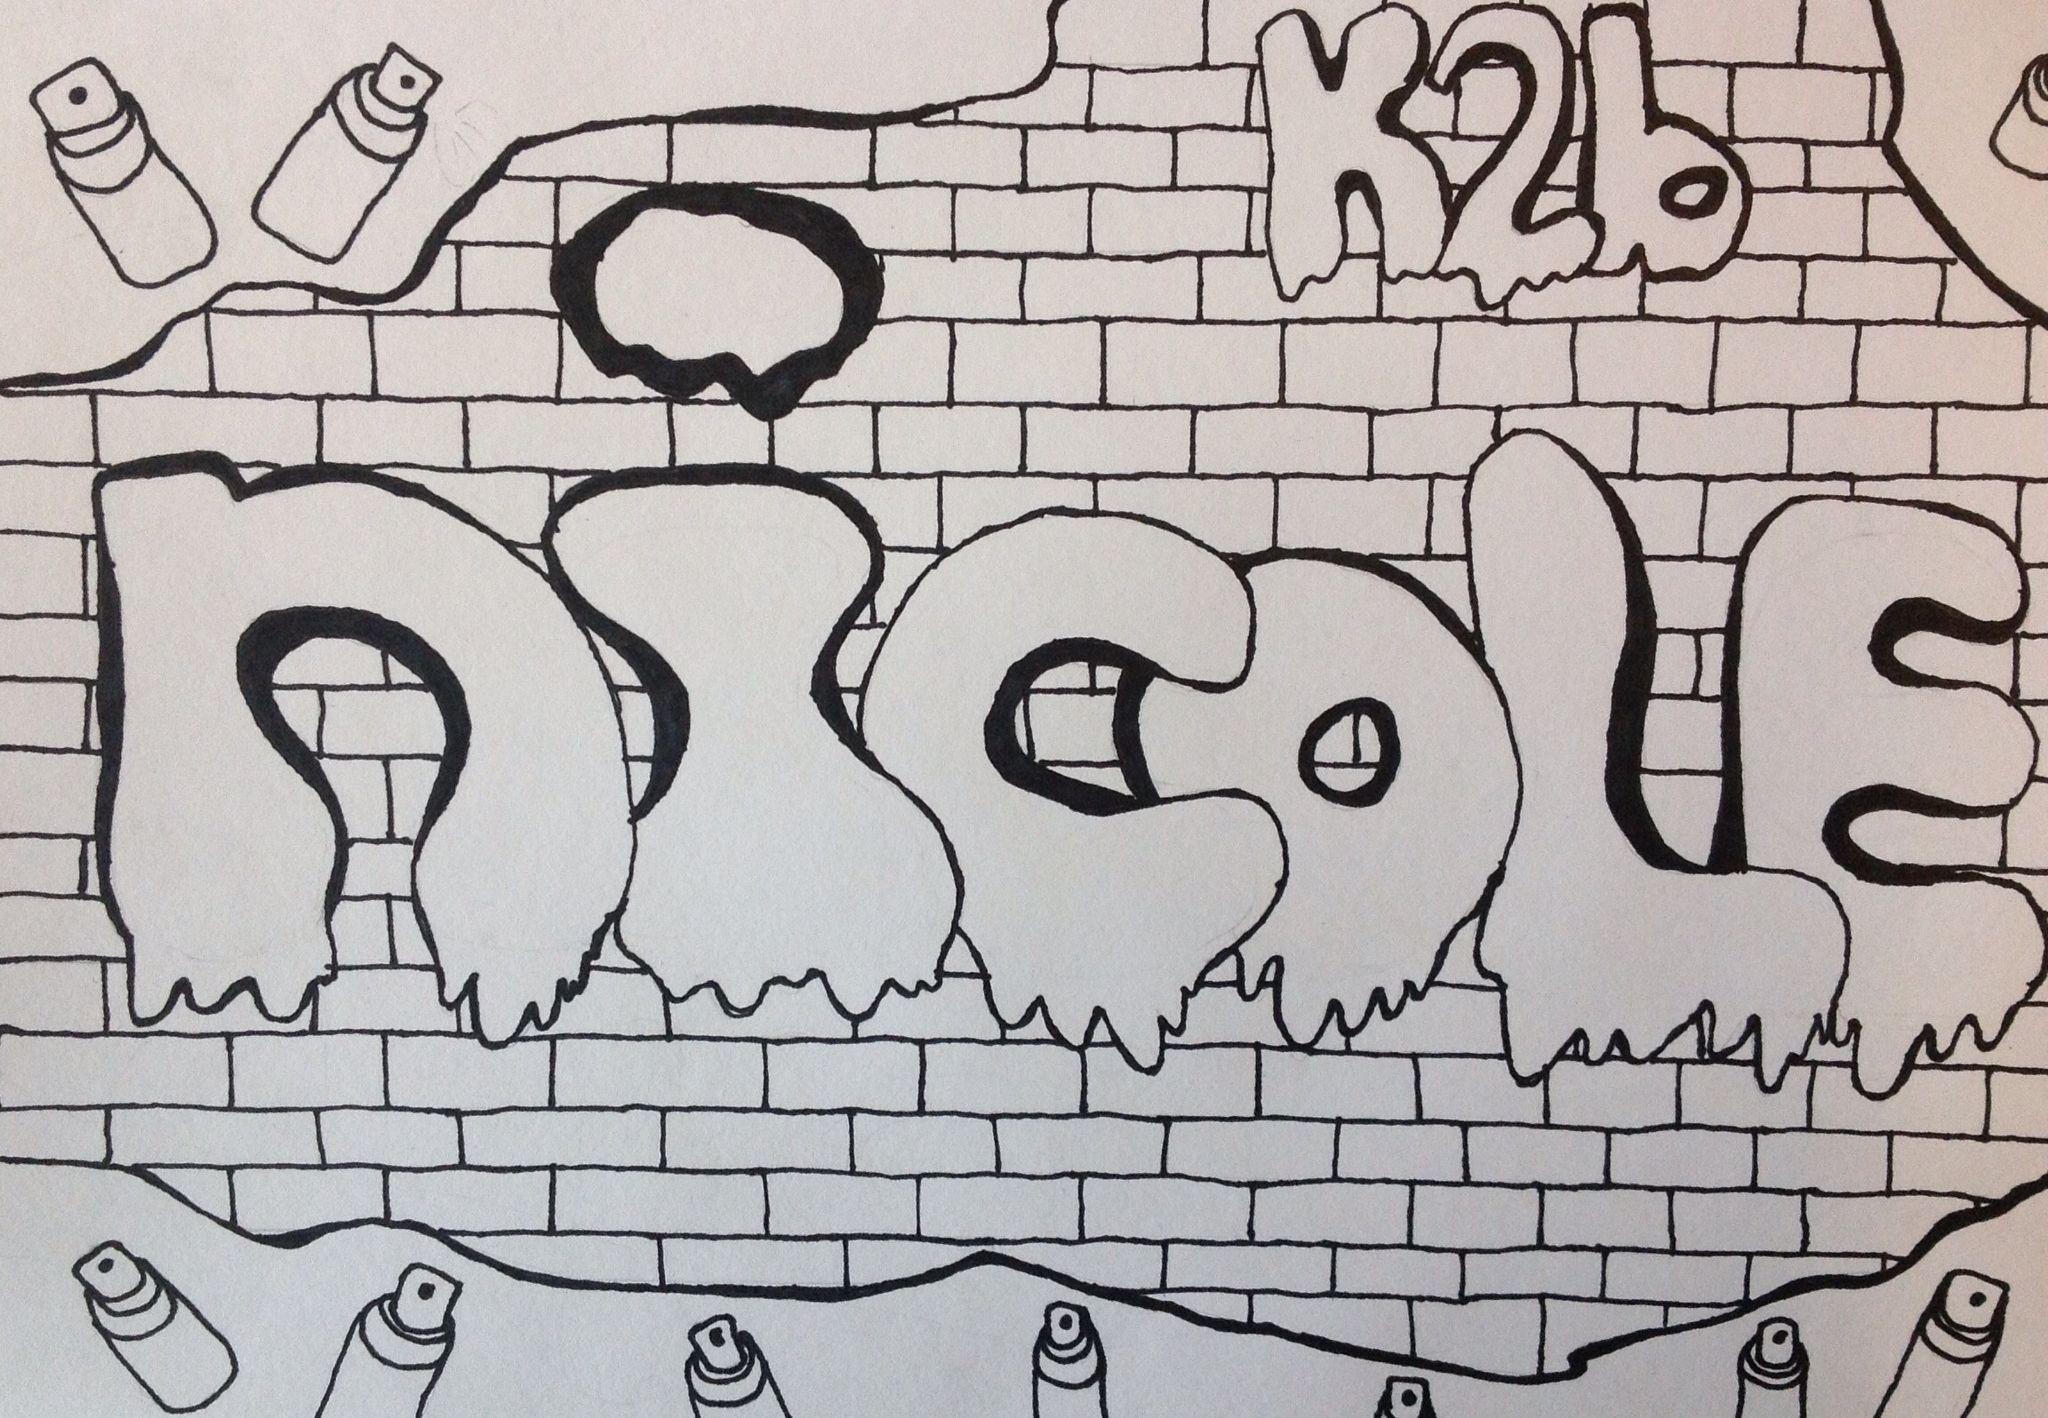 how to draw nicole in graffiti